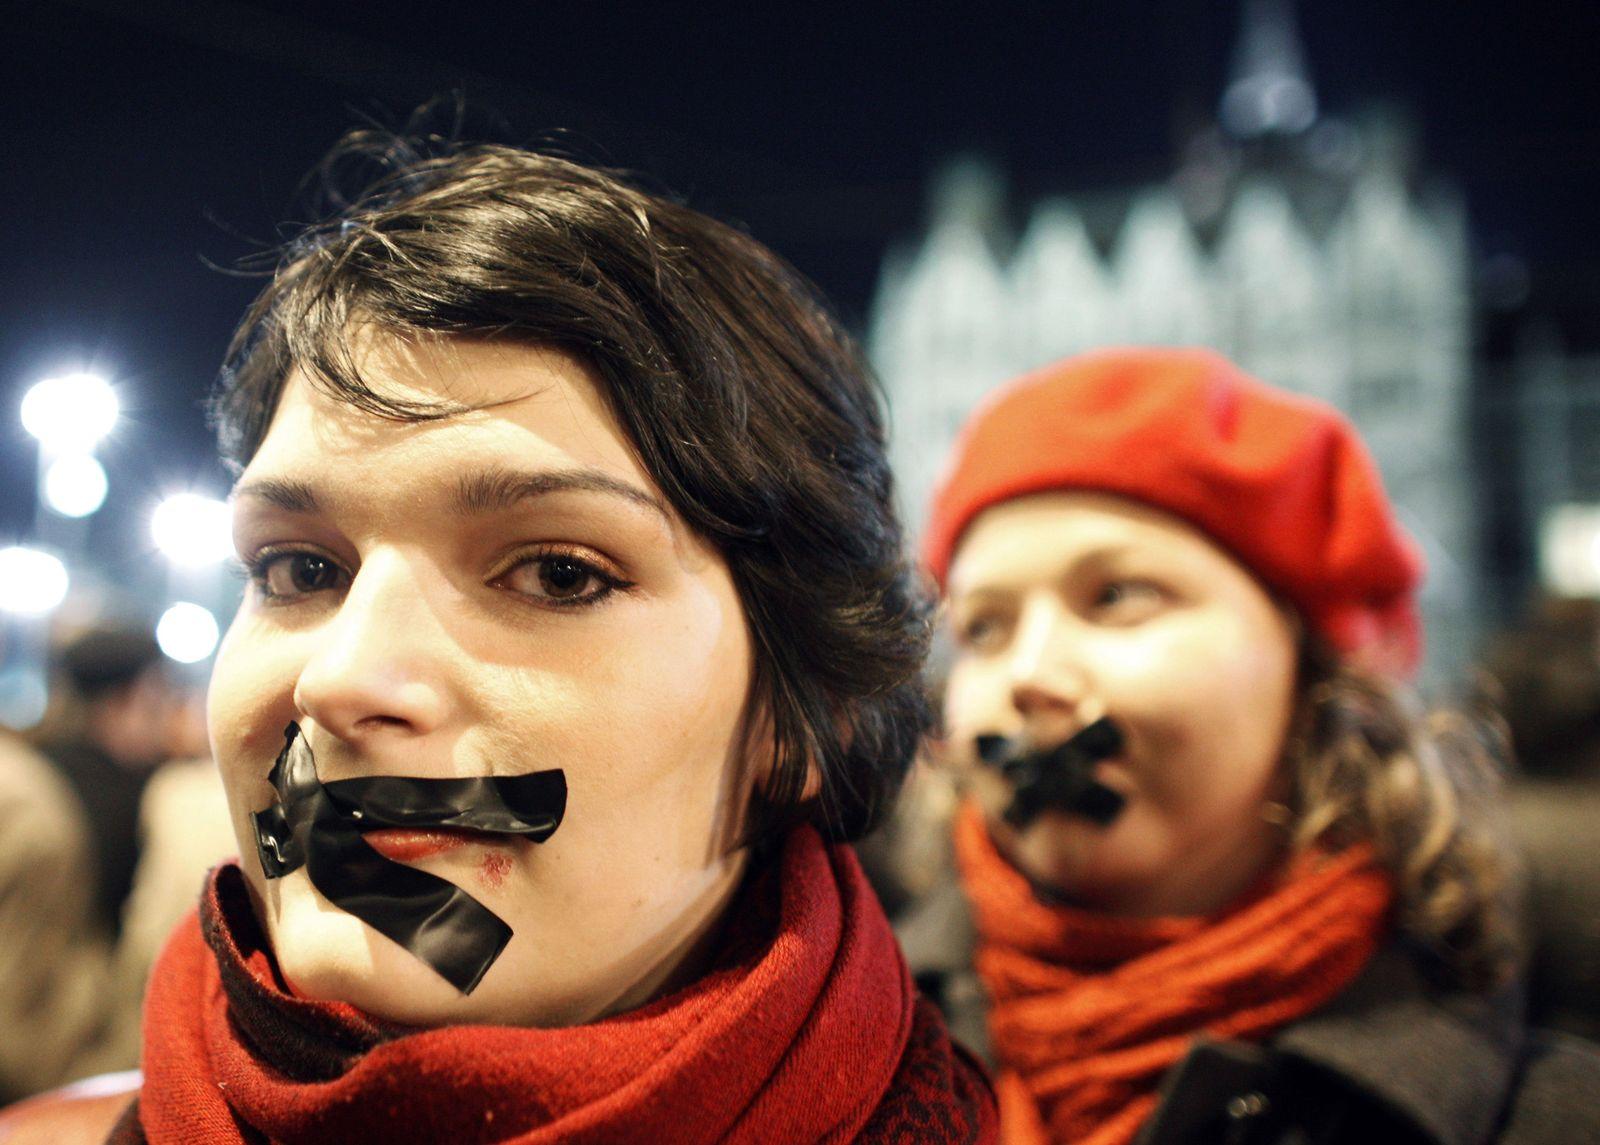 Ungarn/ Mediengesetz/ Proteste